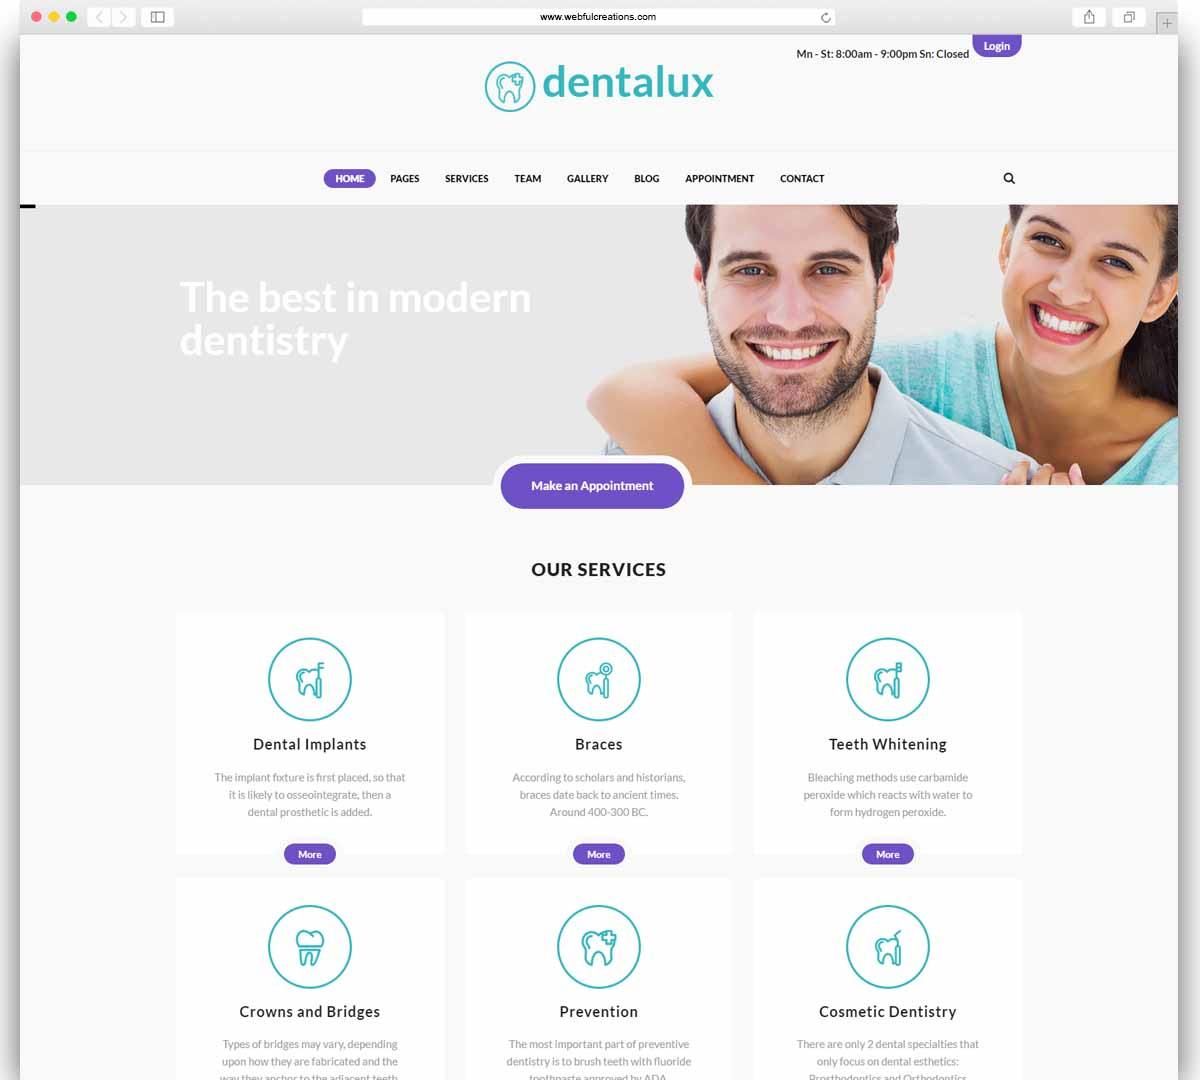 Dentalux - A Dentist Medical & Healthcare WordPress Theme